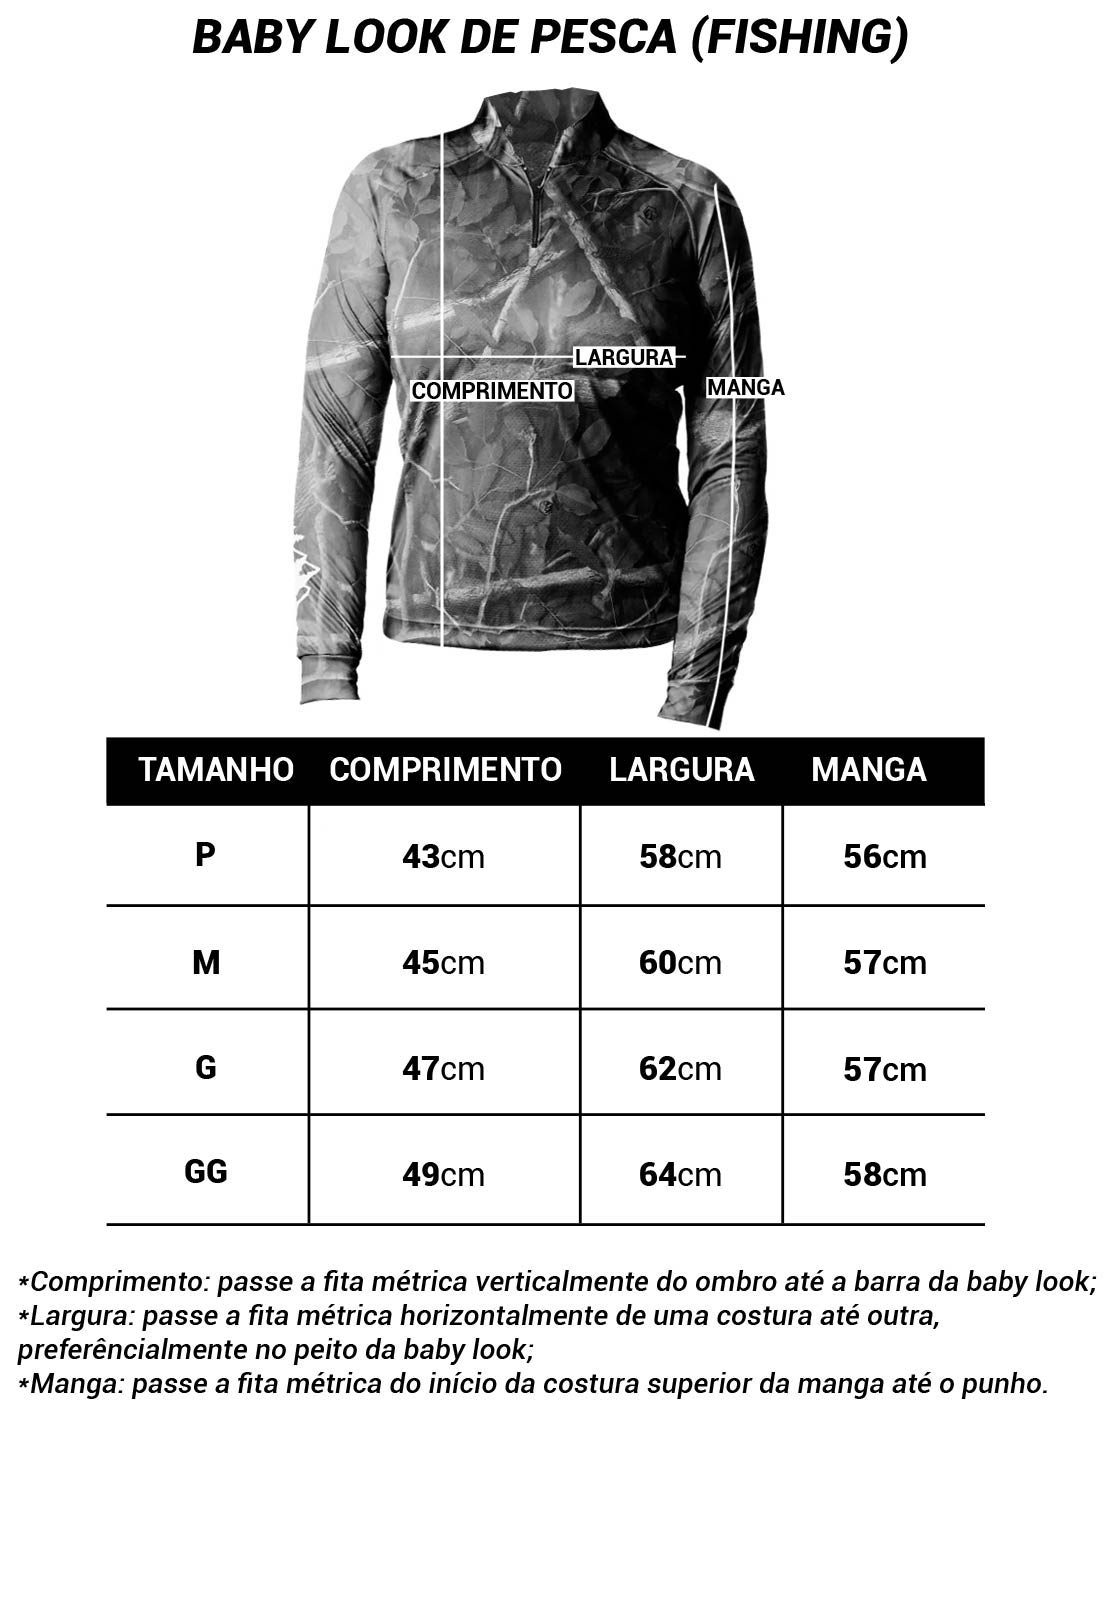 CAMISA DE PESCA FISH CAMUFLADA PRO 24 FEMININA + BANDANA GRÁTIS  - Real Hunter